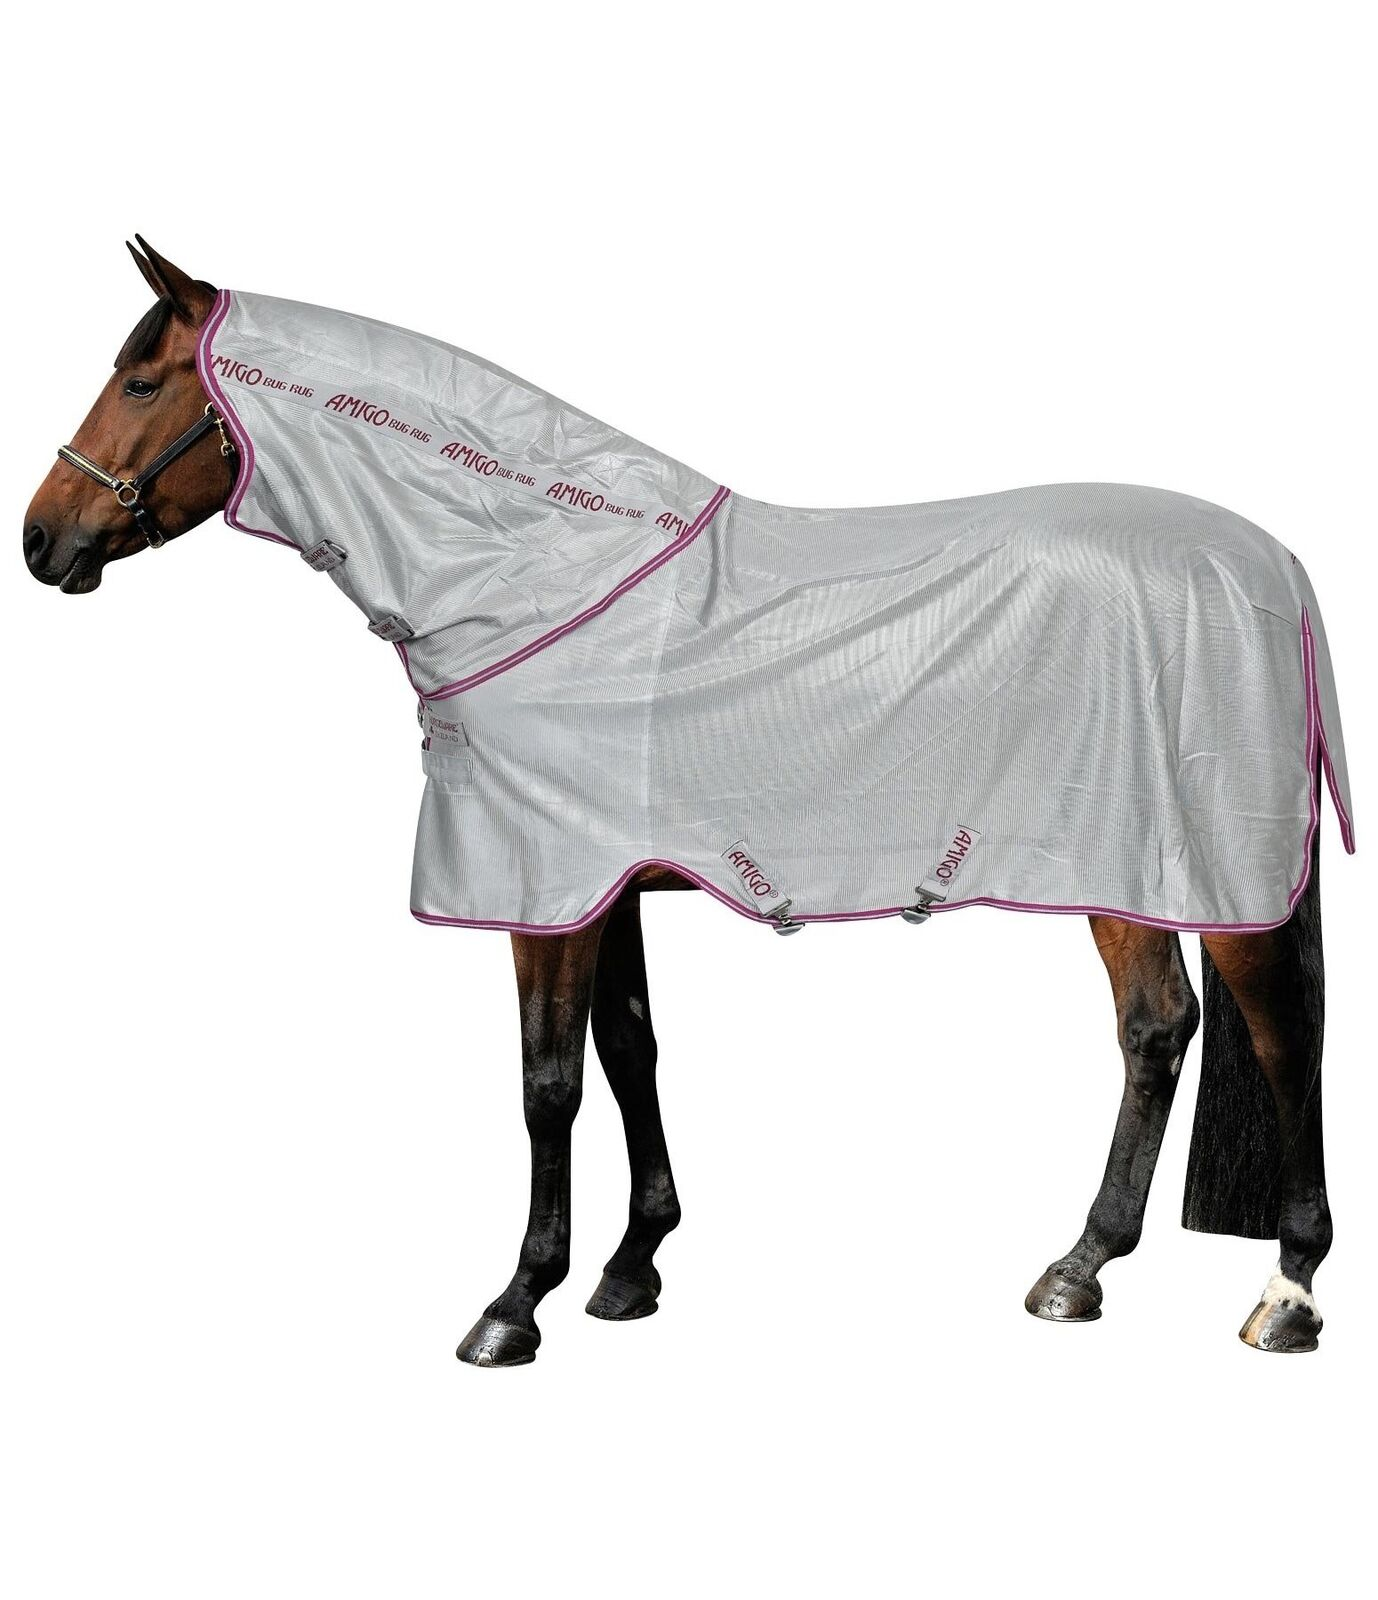 Horseware Amigo Bug Rug XL, Fly  Rug for very large horses  large discount